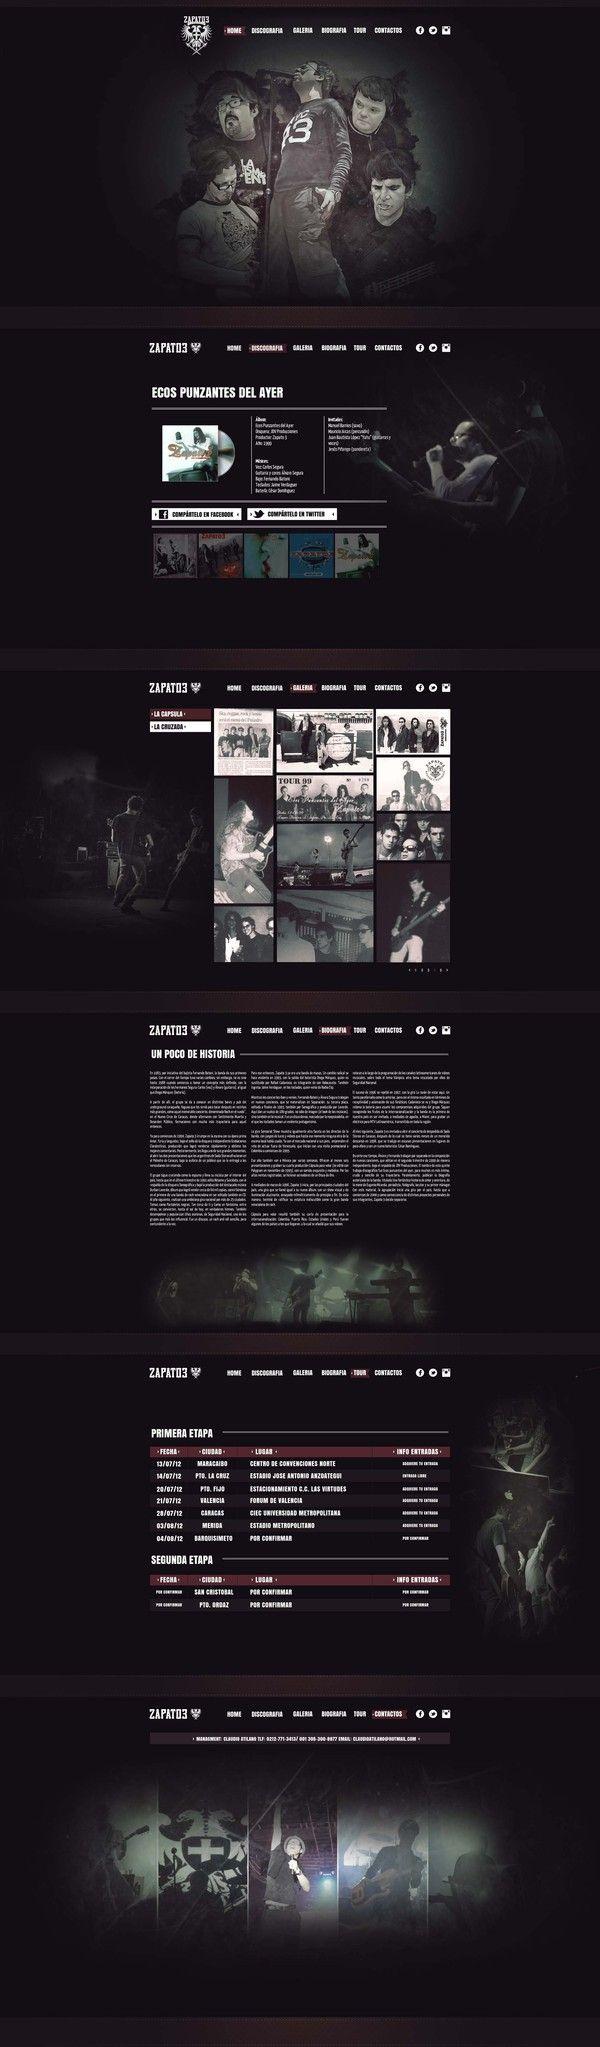 Web Design Zapato 3 by Loopstok , via Behance